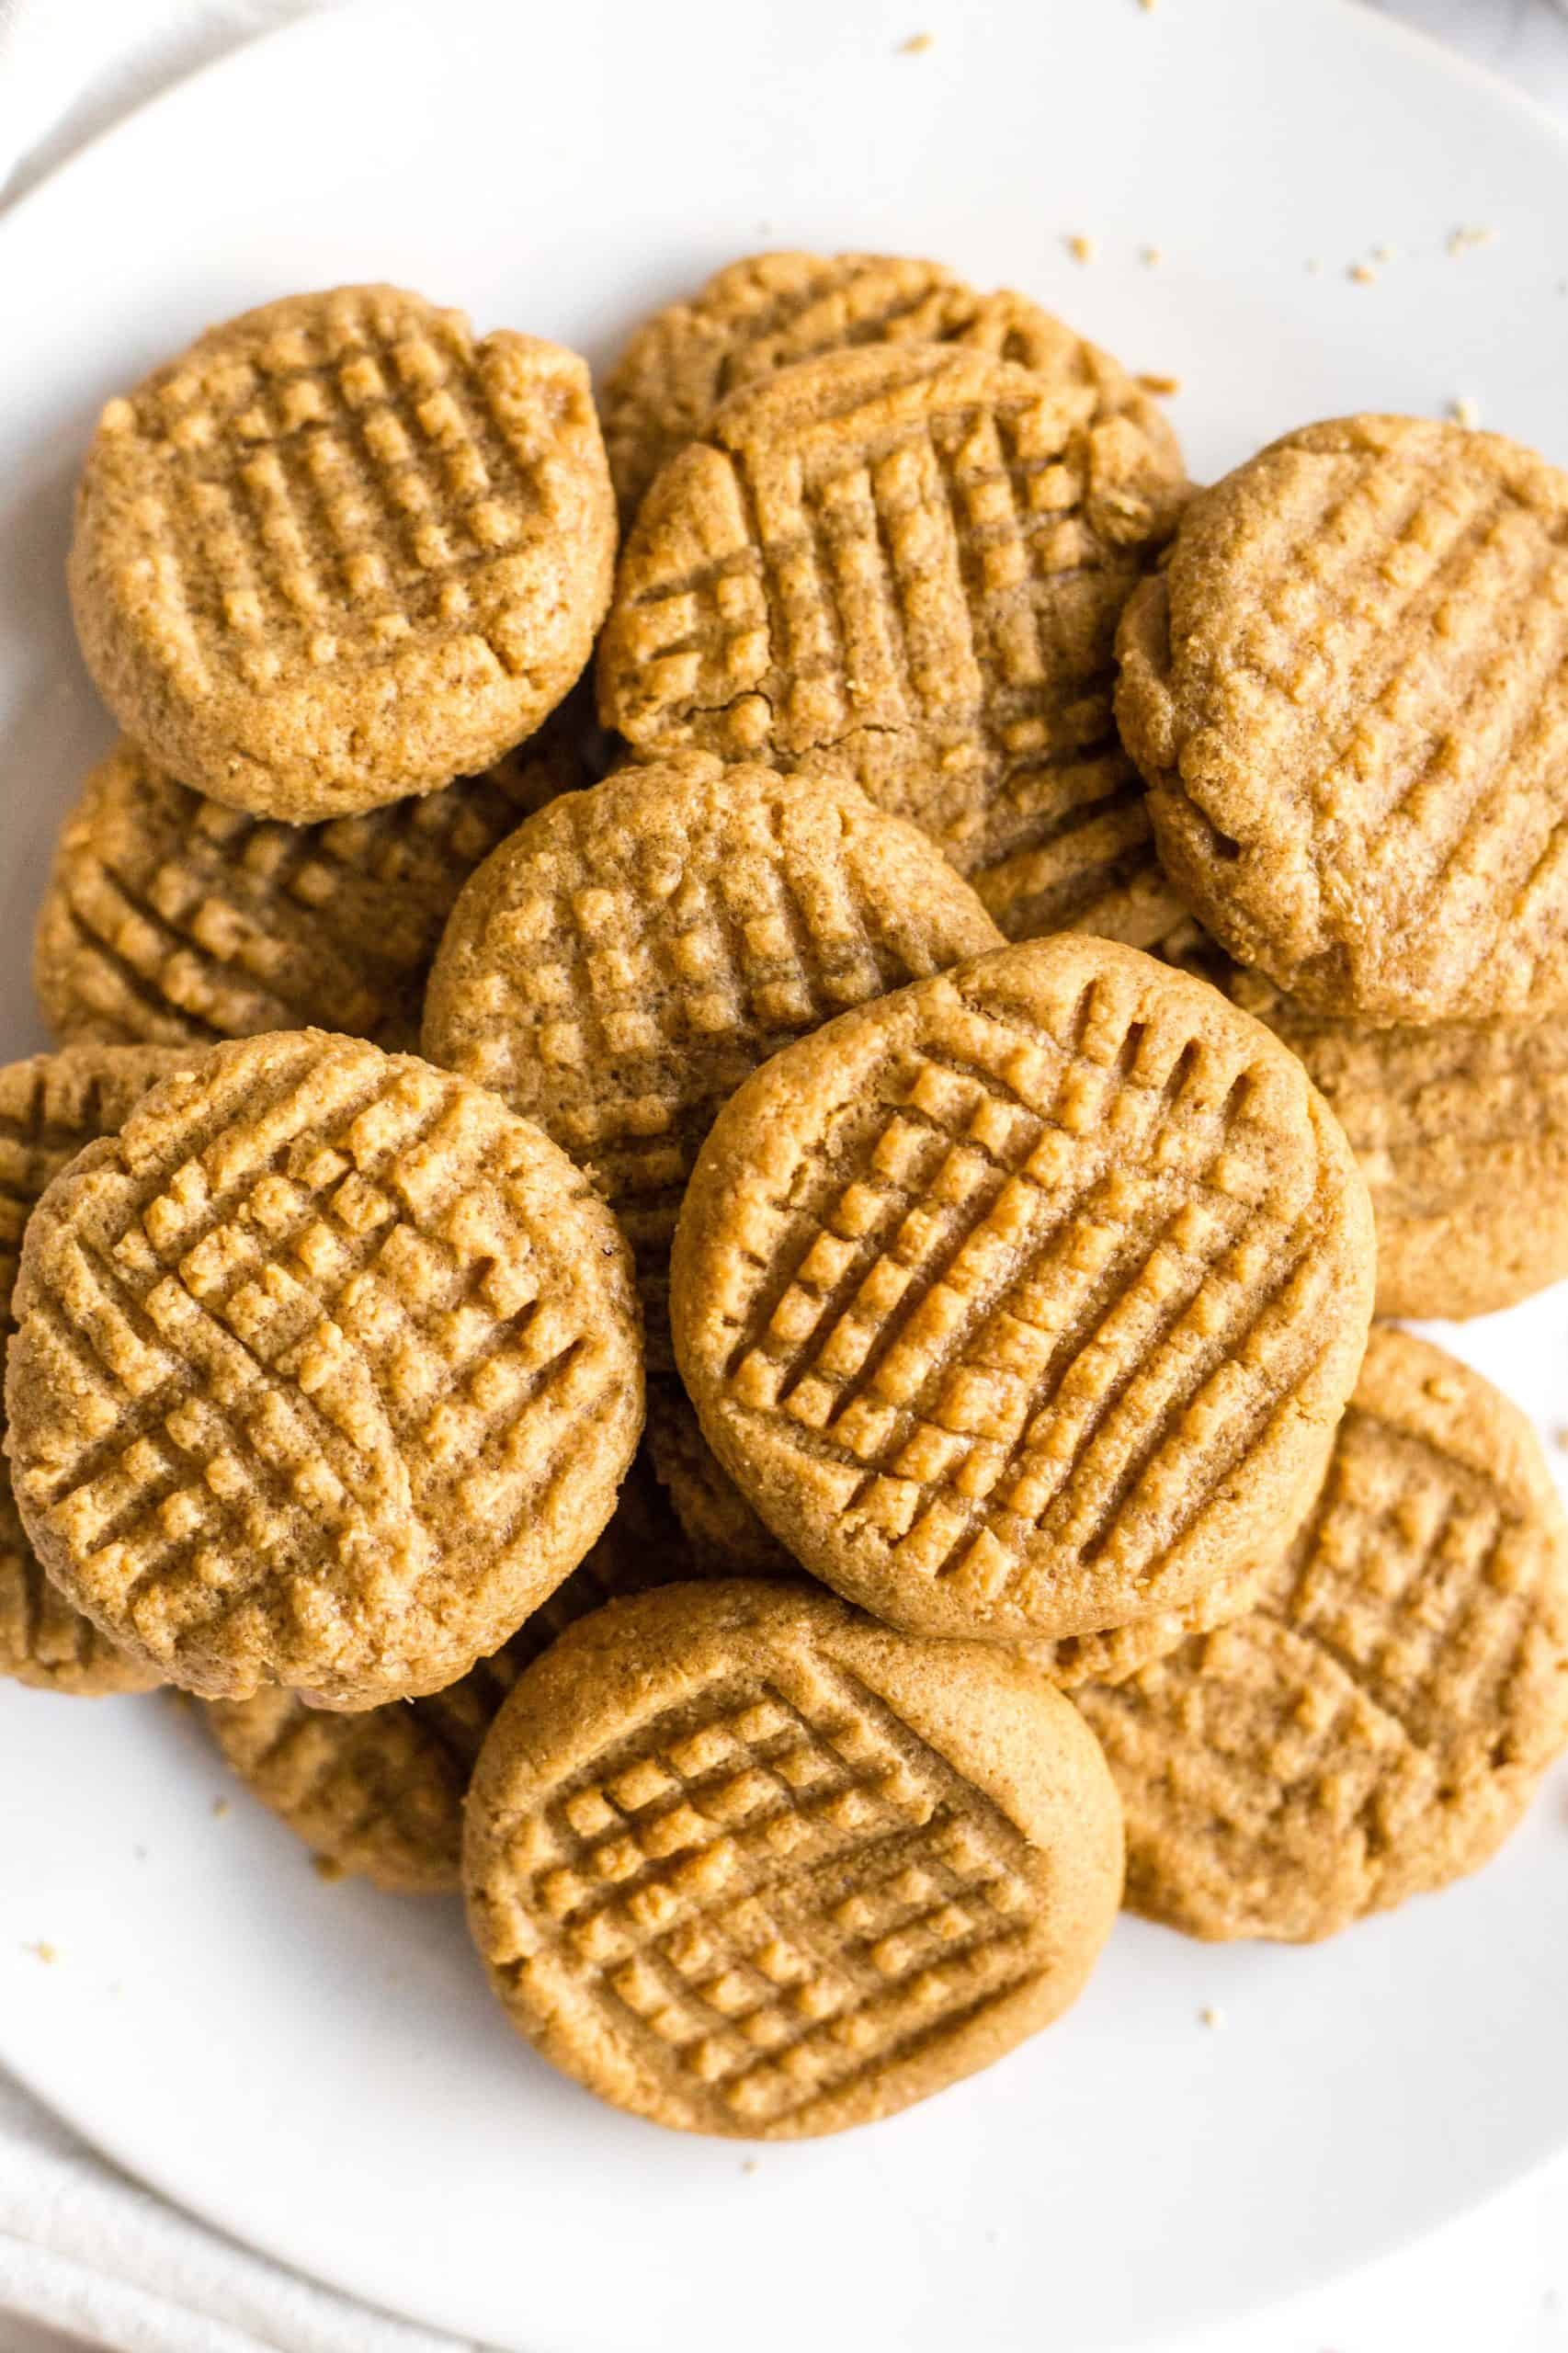 A plate full of flourless peanut butter cookies.